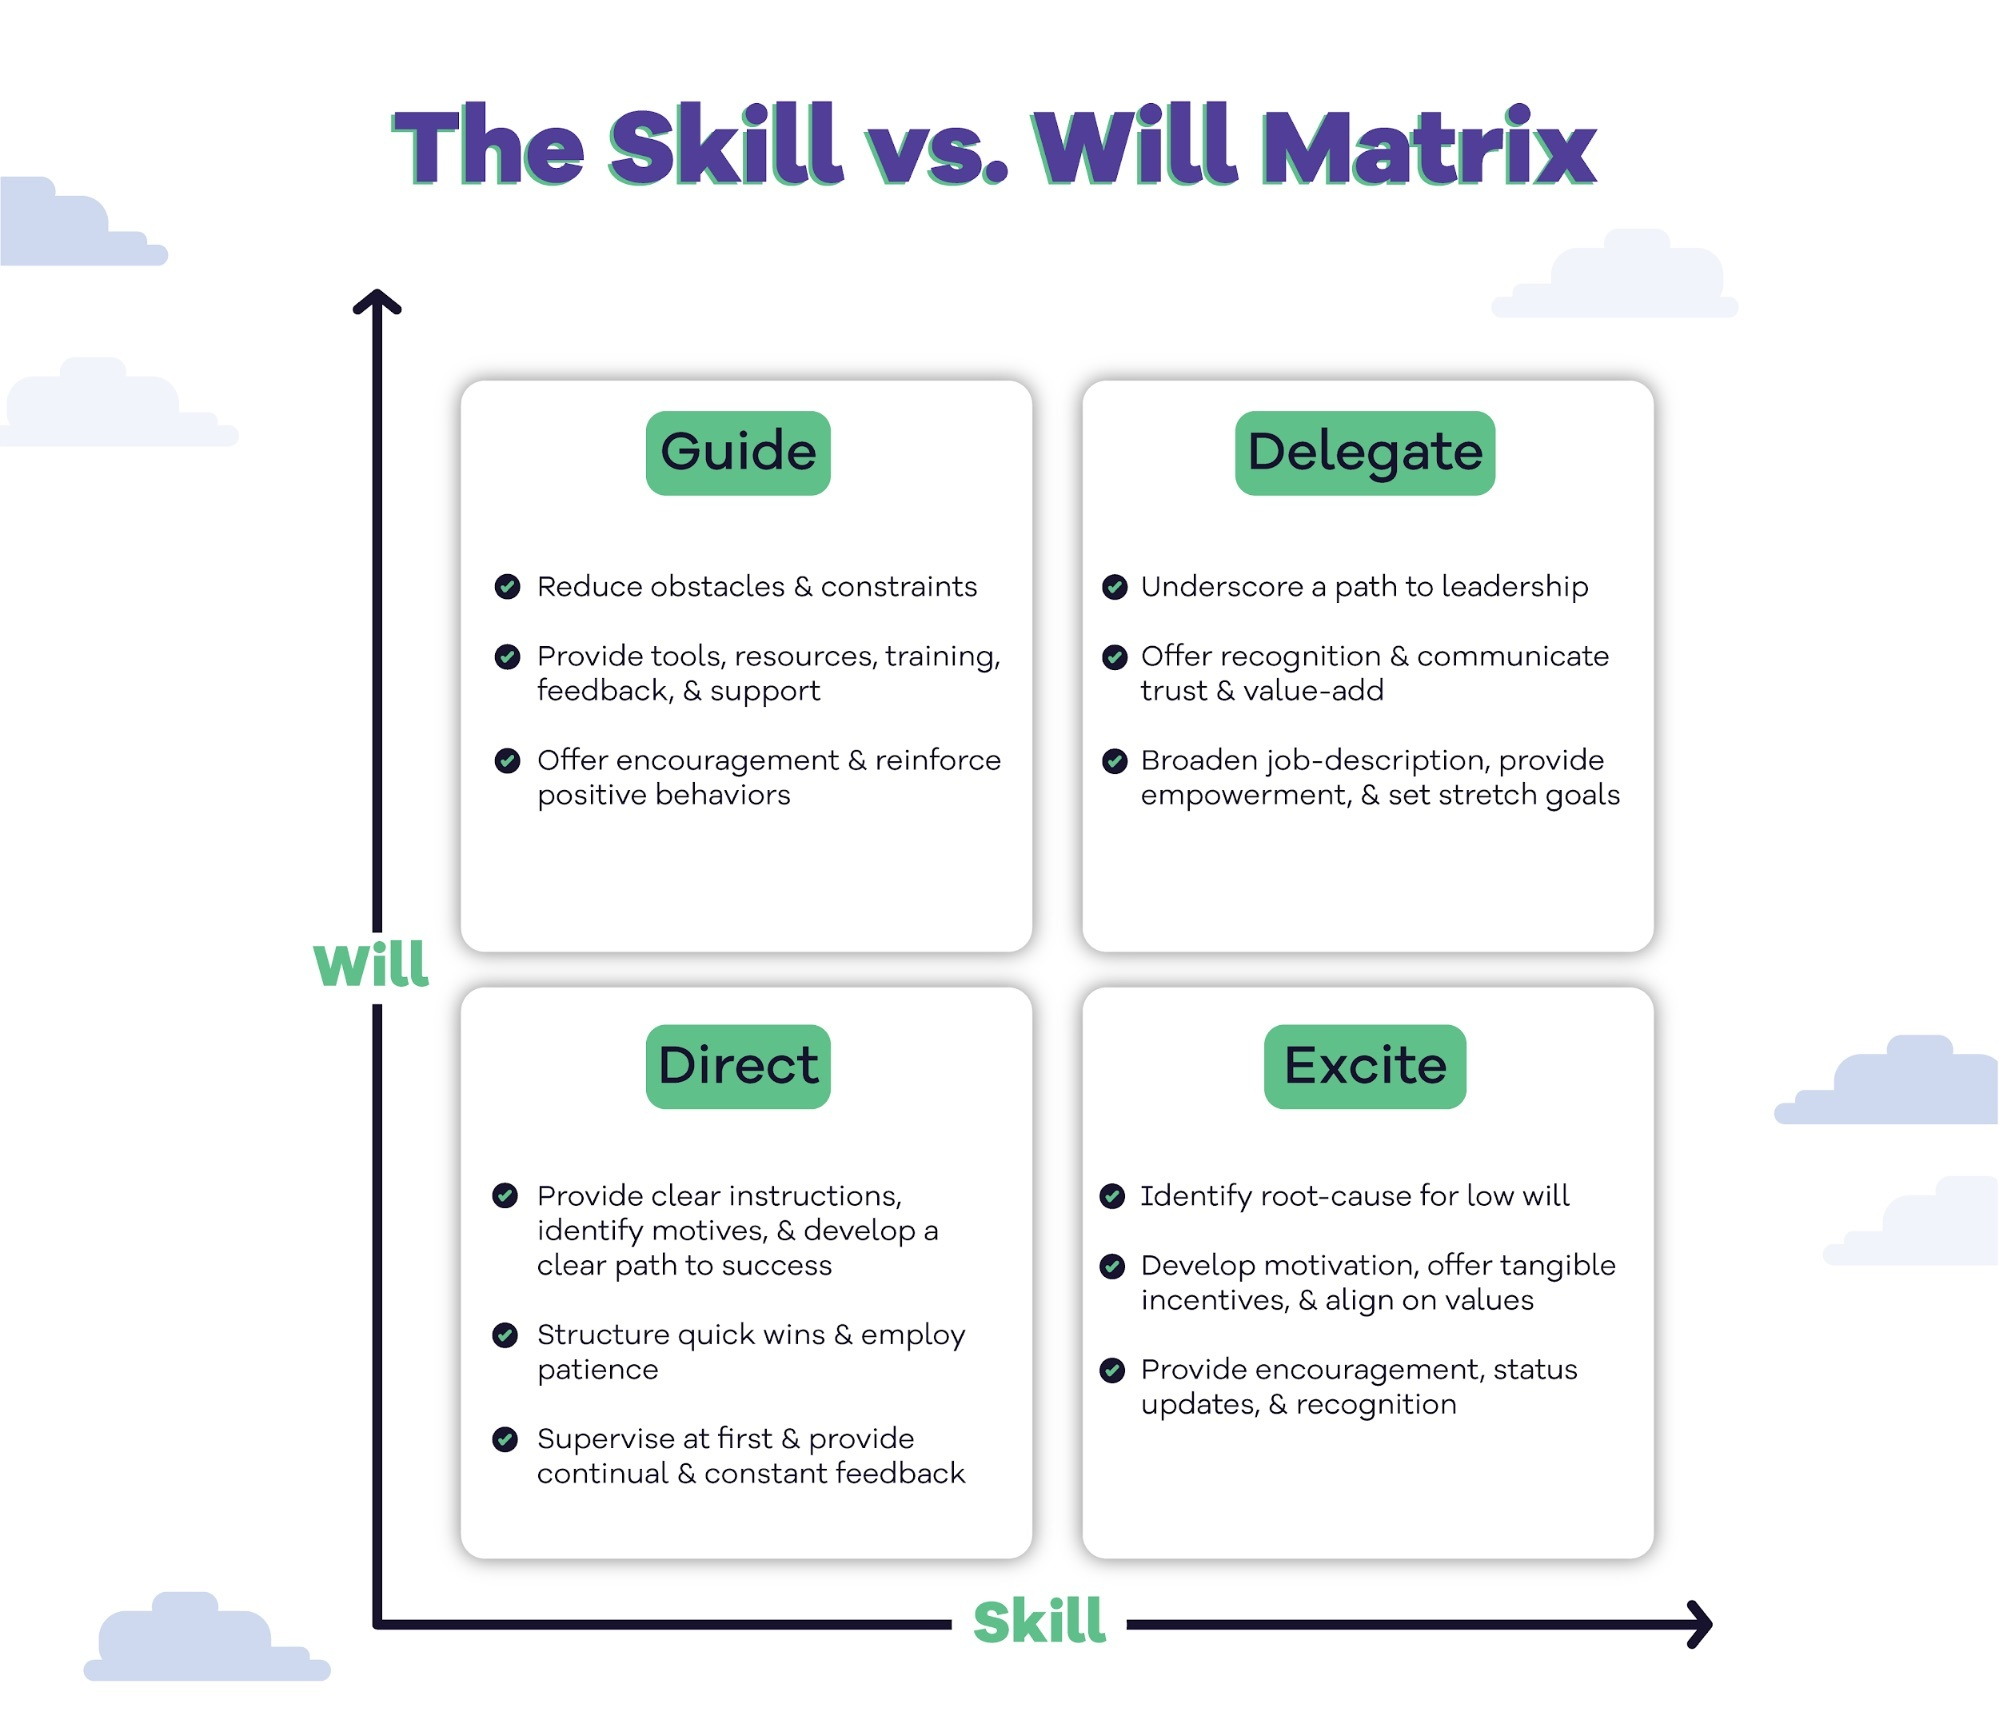 skill vs will matrix